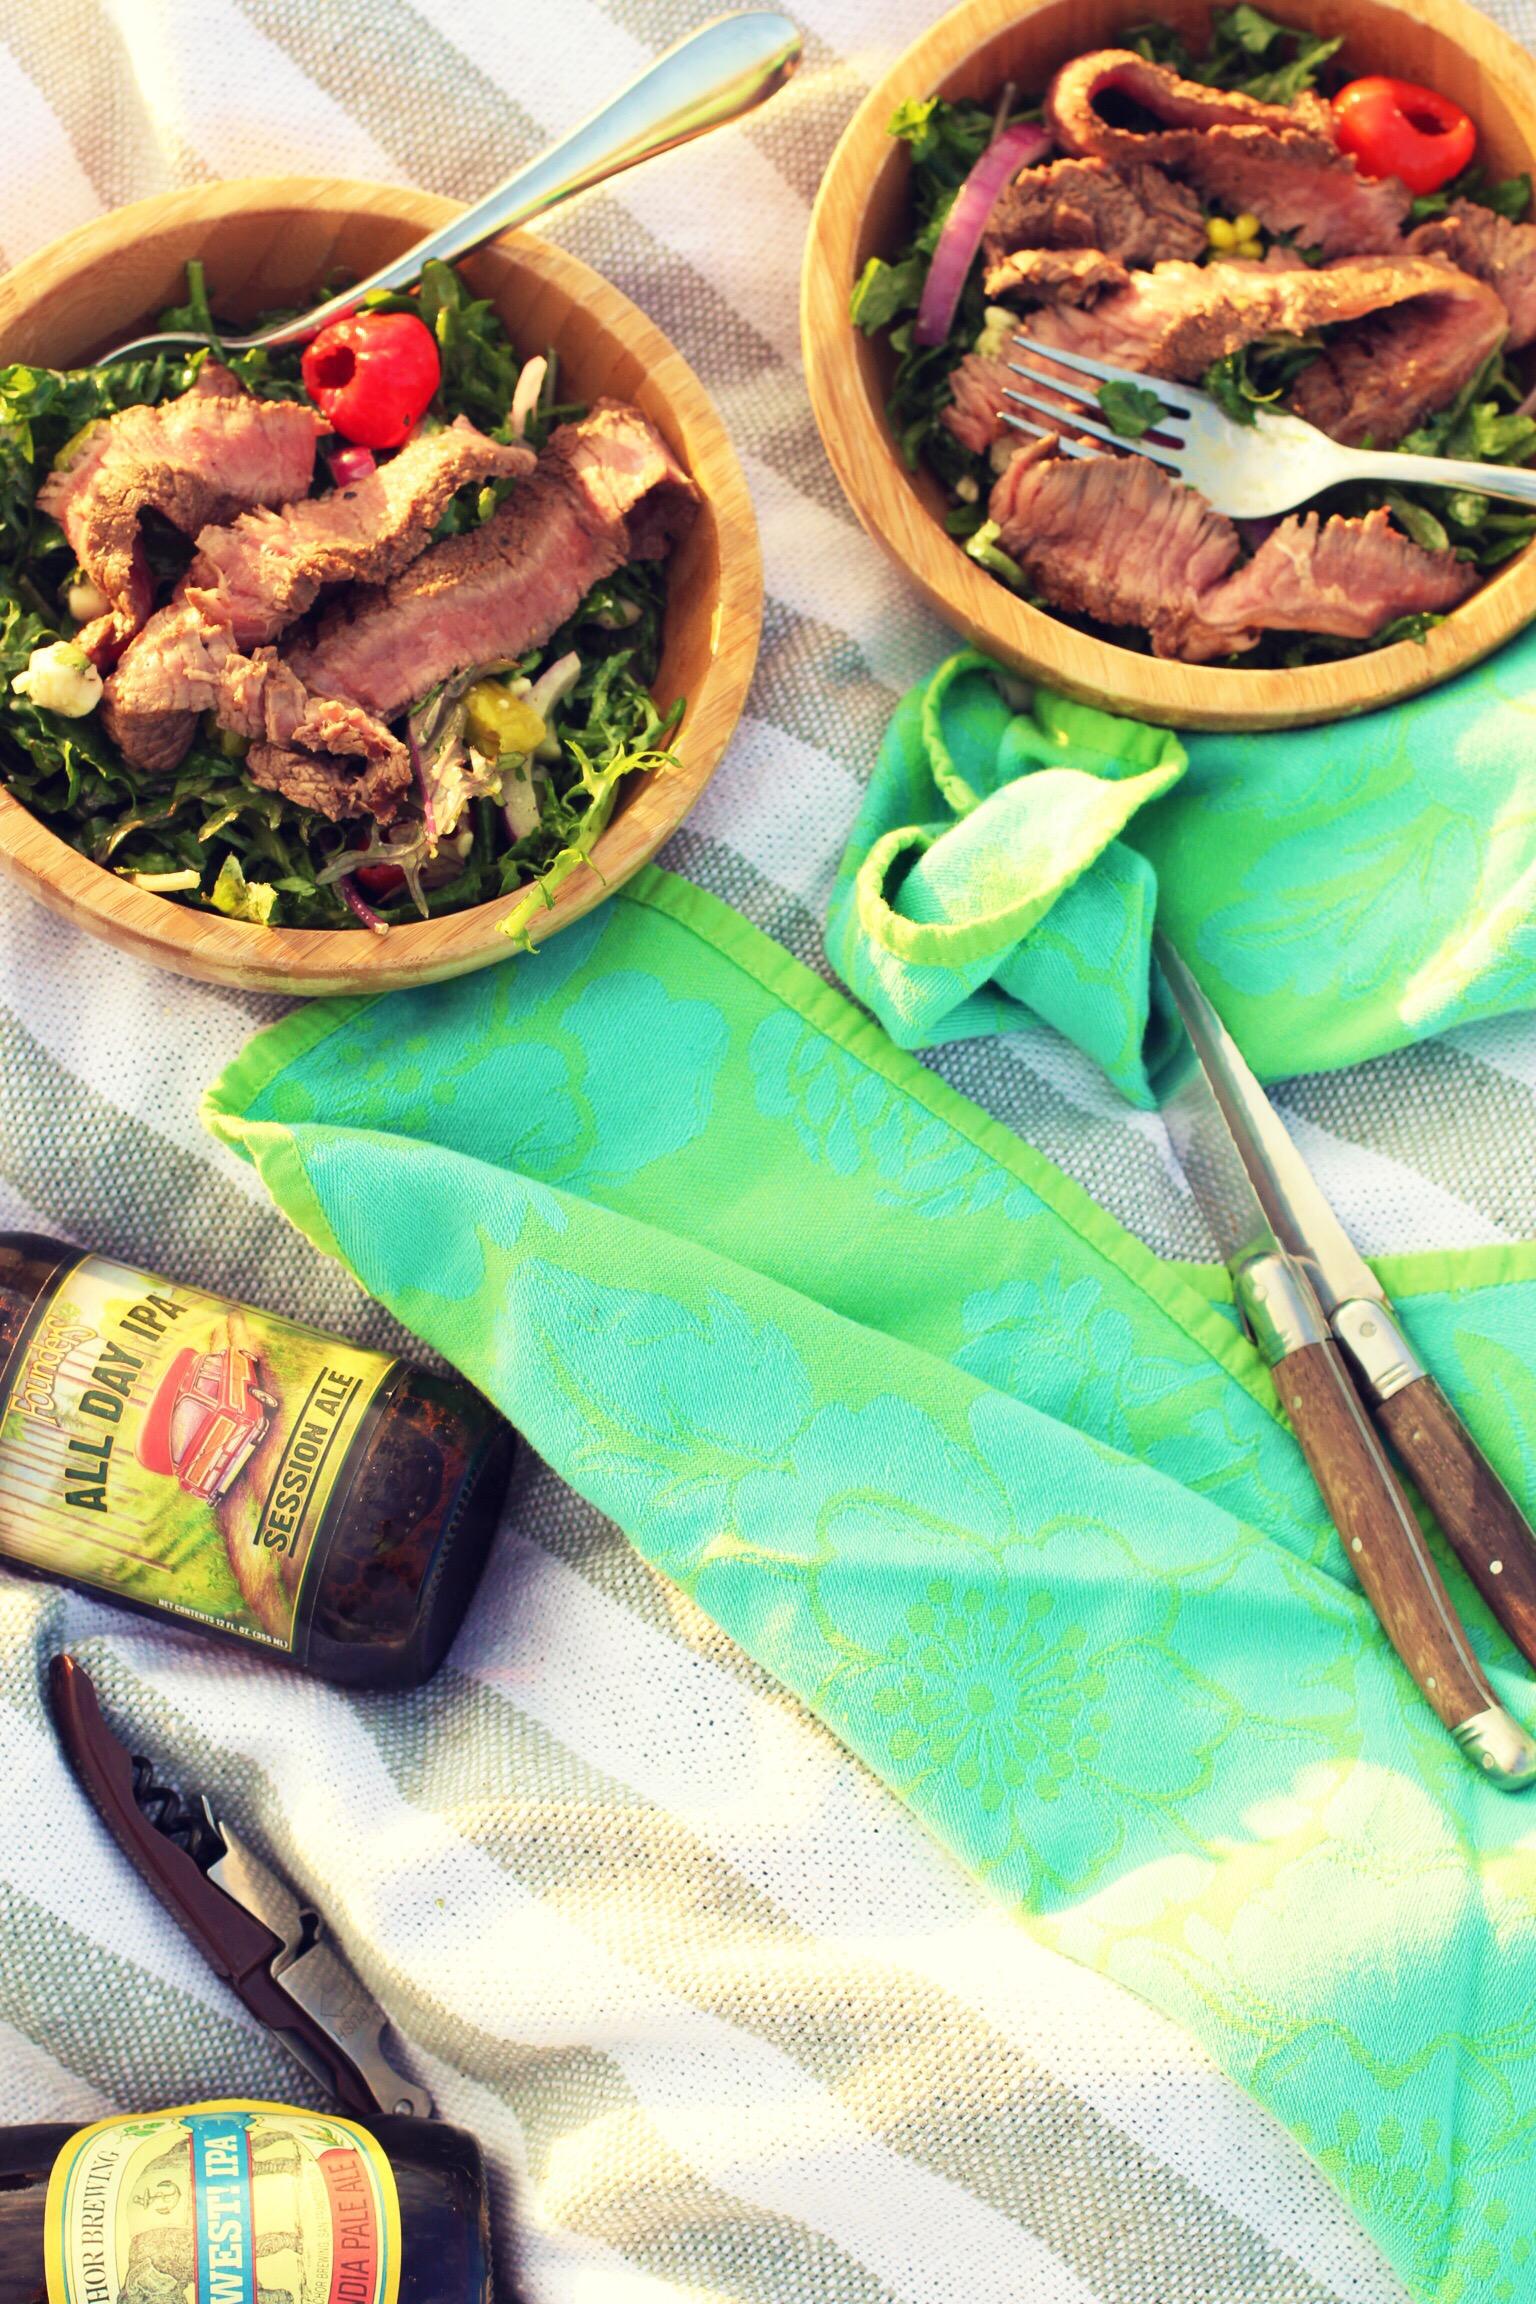 Summer picnic steak salad - The Pastiche